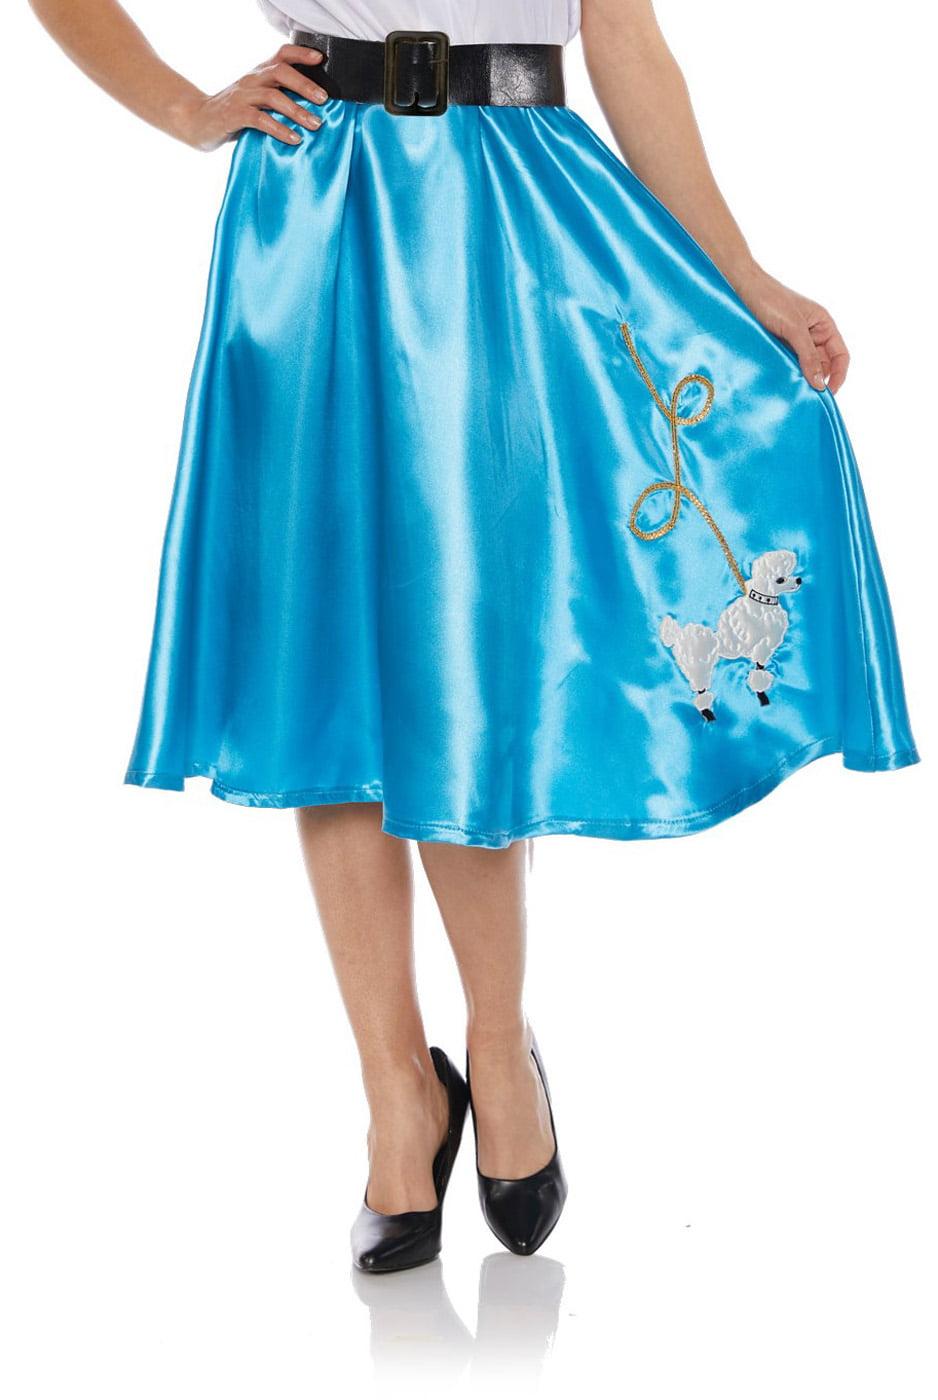 Adult Underwraps Costume White or Pink 50/'s Poodle Shirt Sock Hop